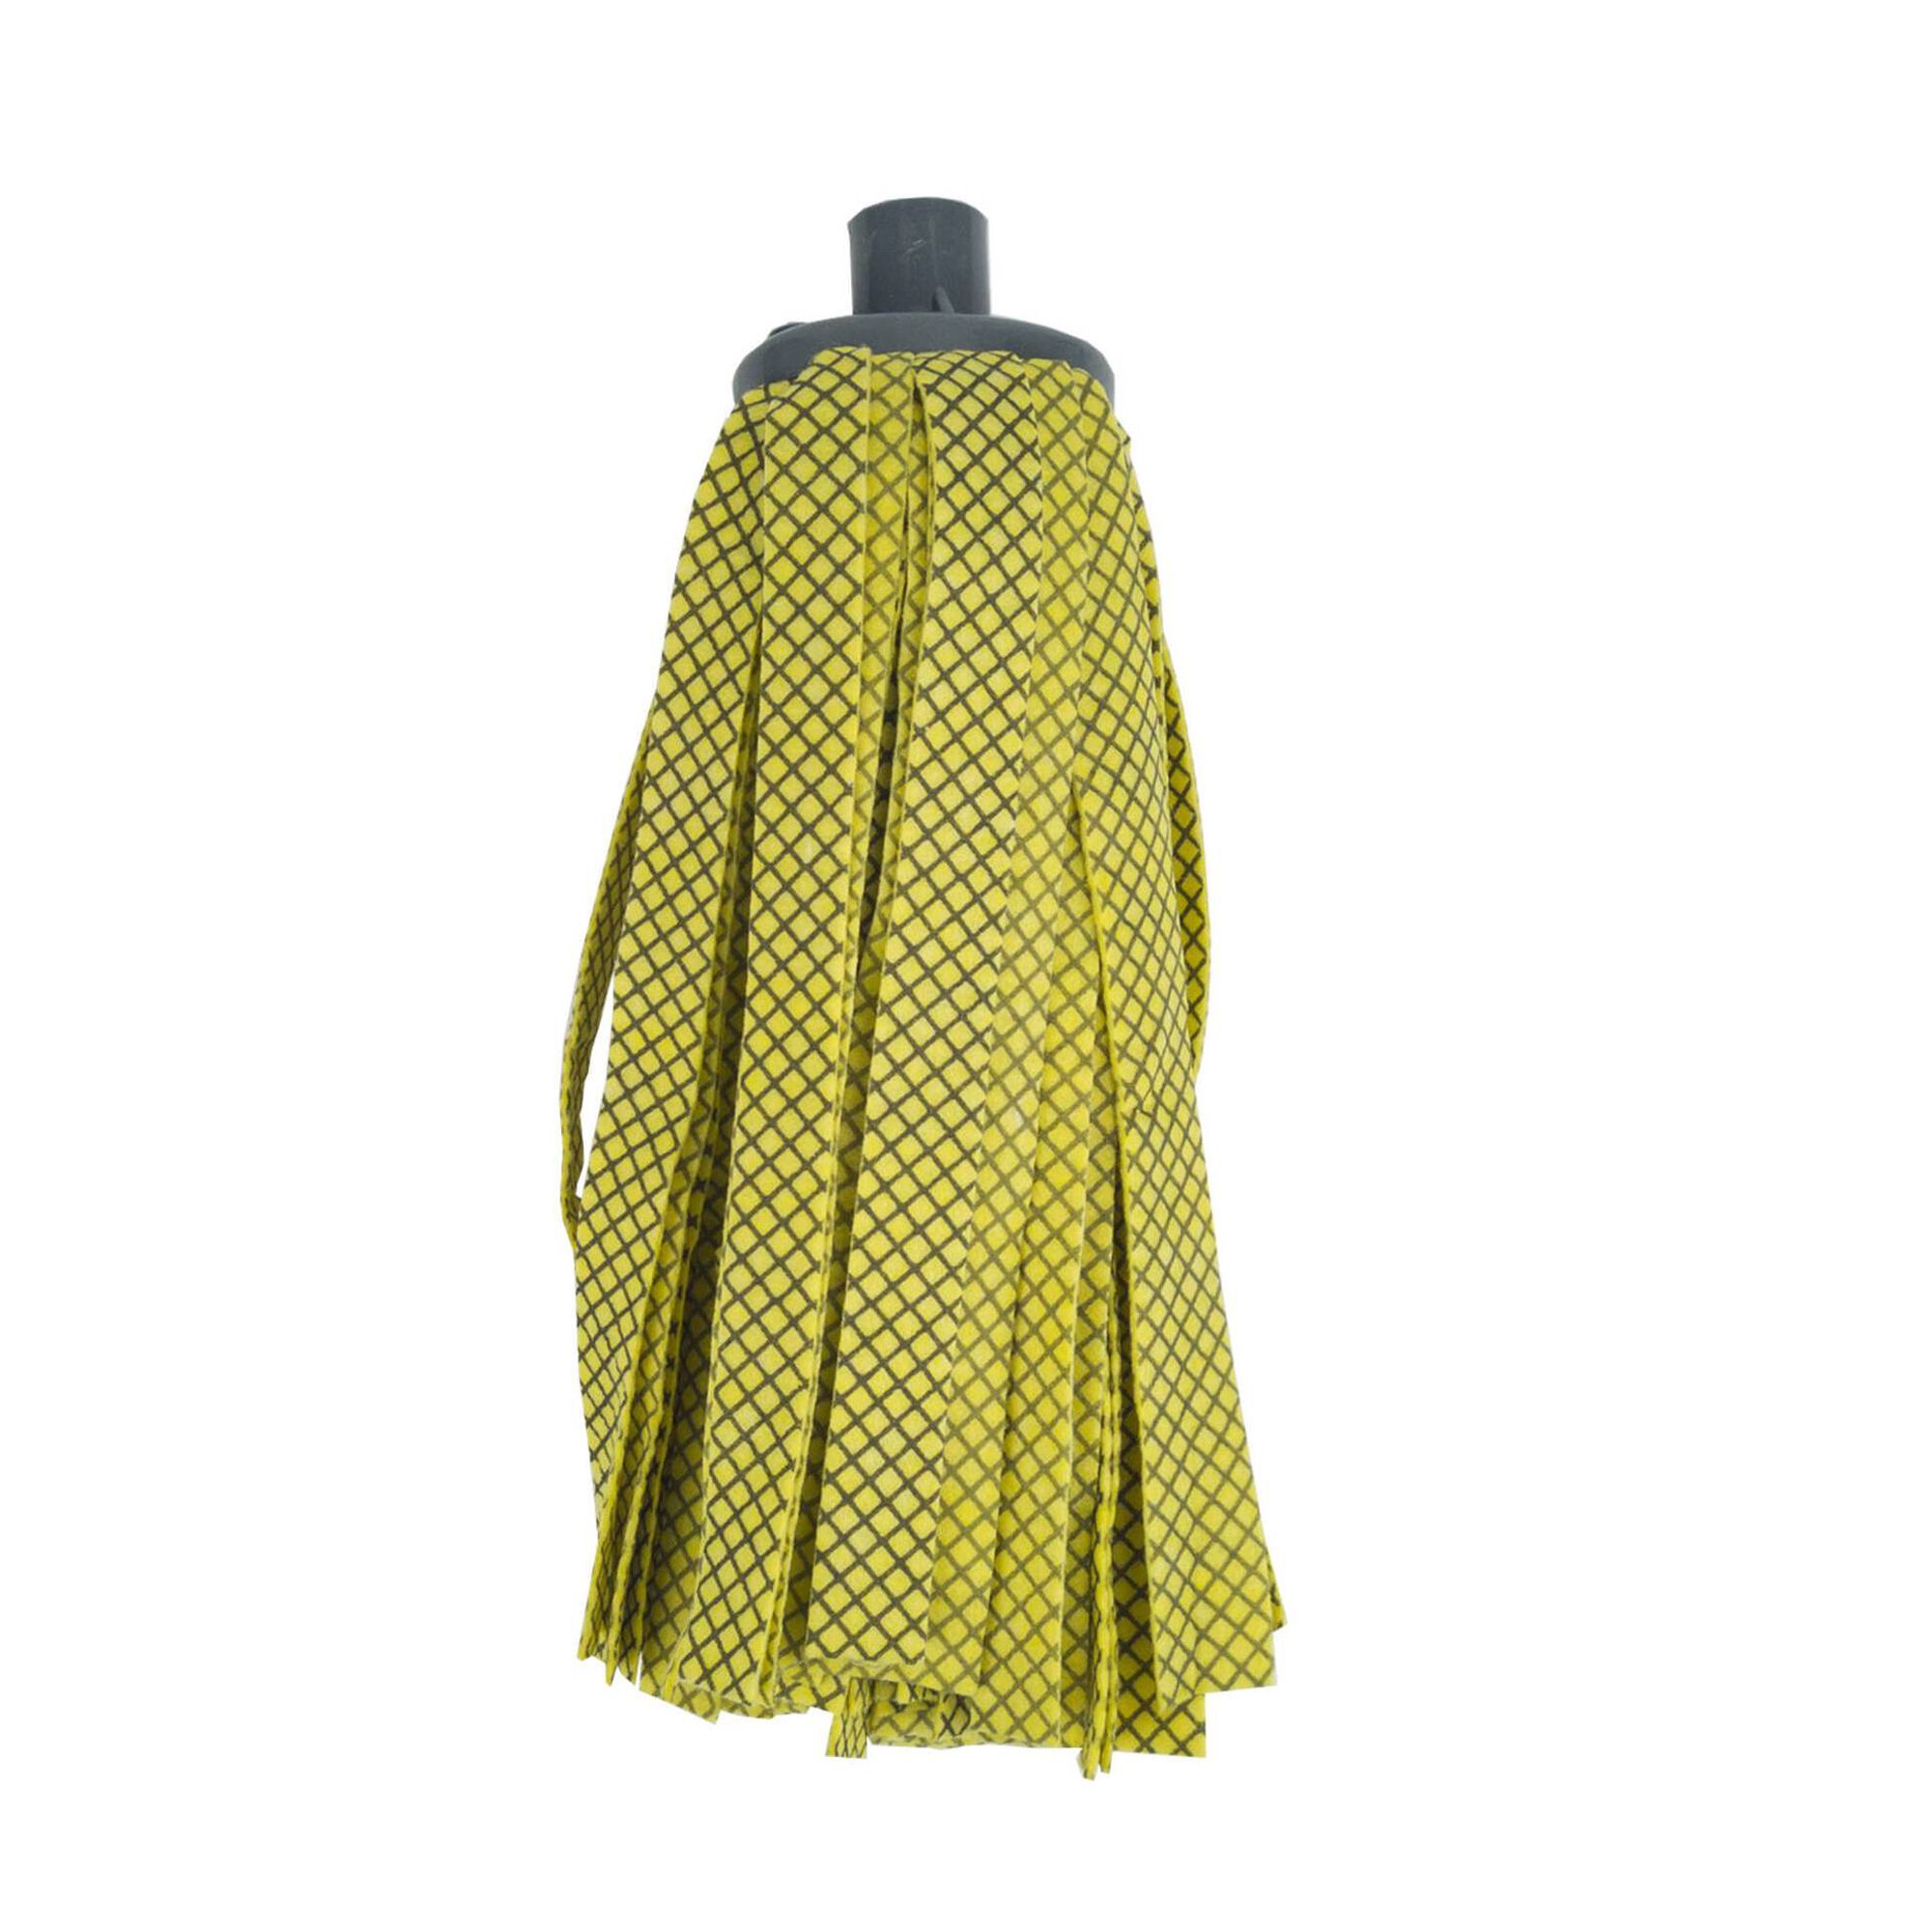 Recarga Esfregona Tiras Microfibra Amarelas Premium Perfect